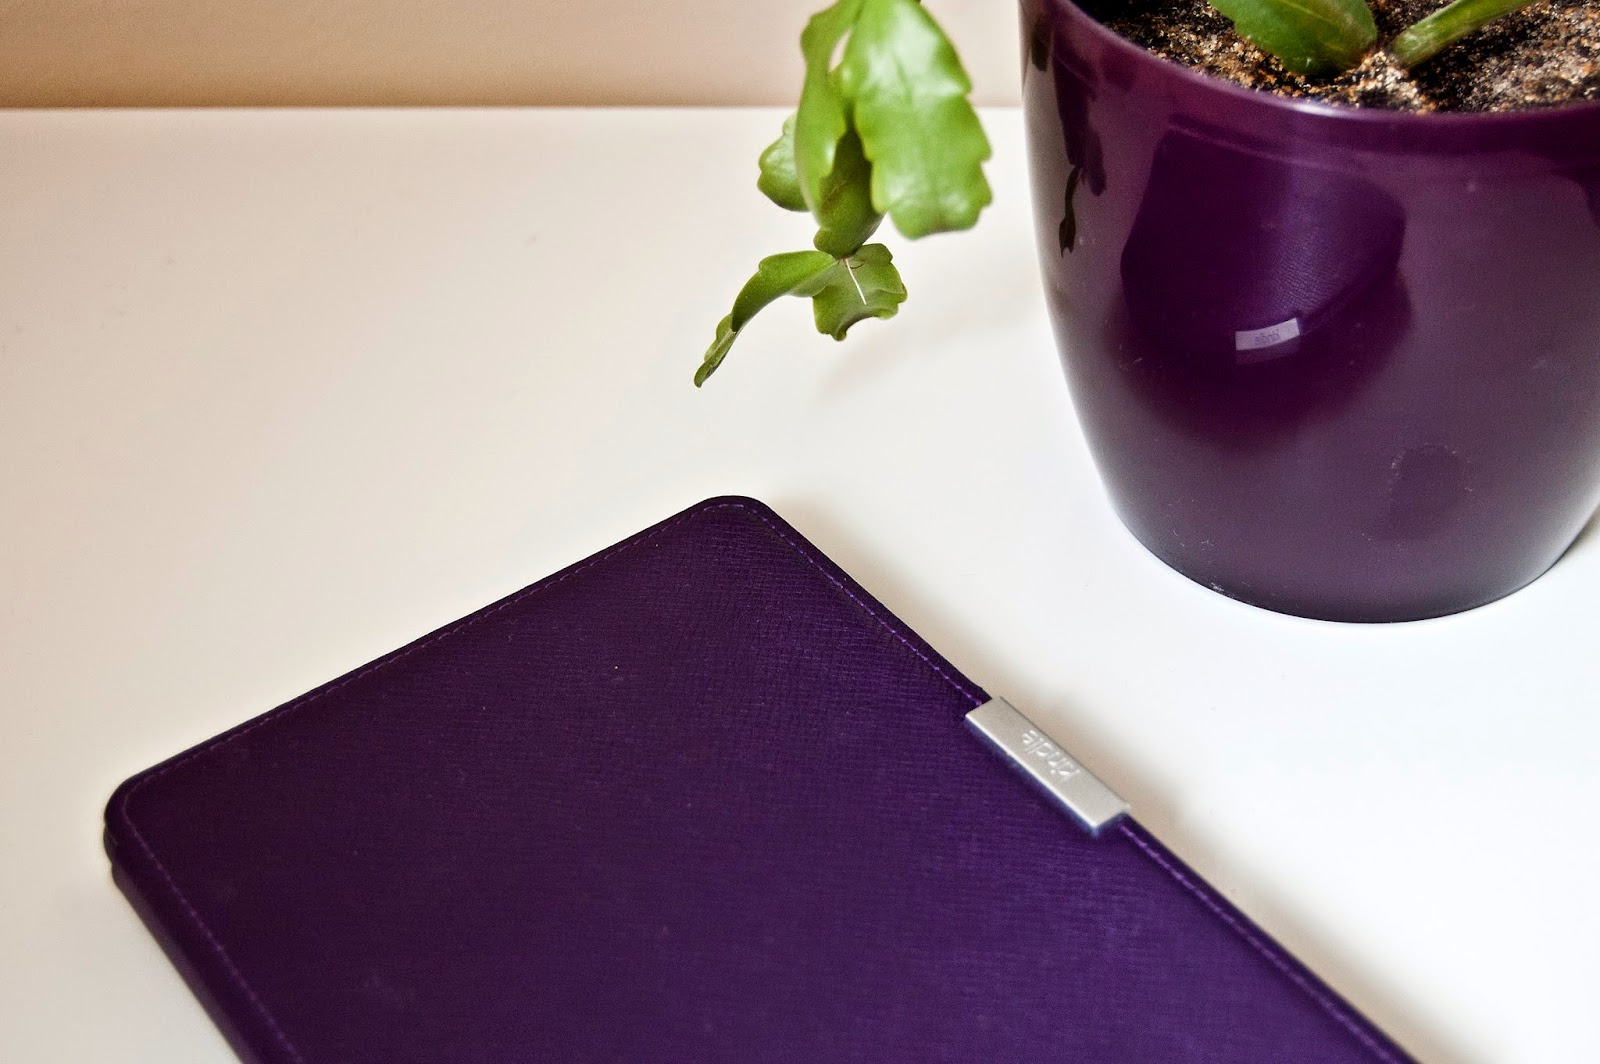 czytnik e-book reader